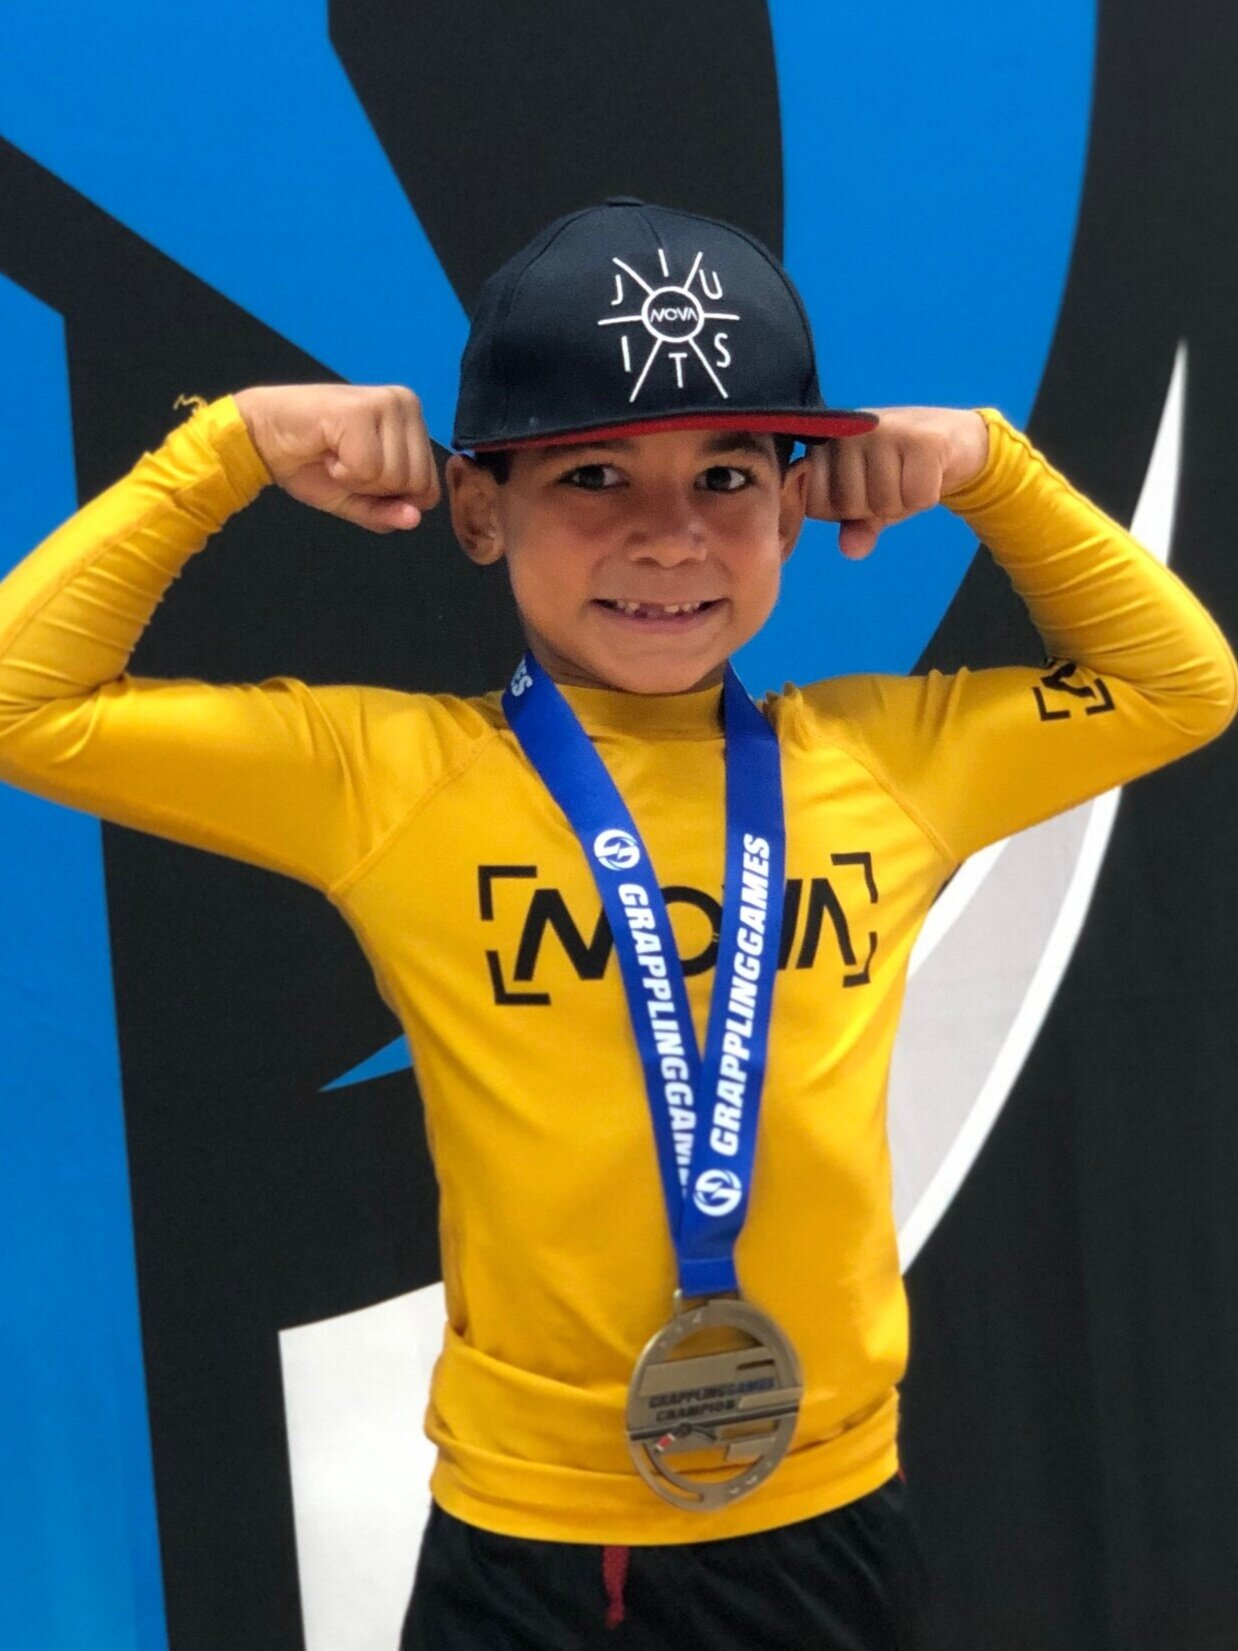 Kids+BJJ+Tournament+Winner+Nova+Gyms+Oak+Creek+WI+Milwaukee+Brazilian+Jiu+Jitsu